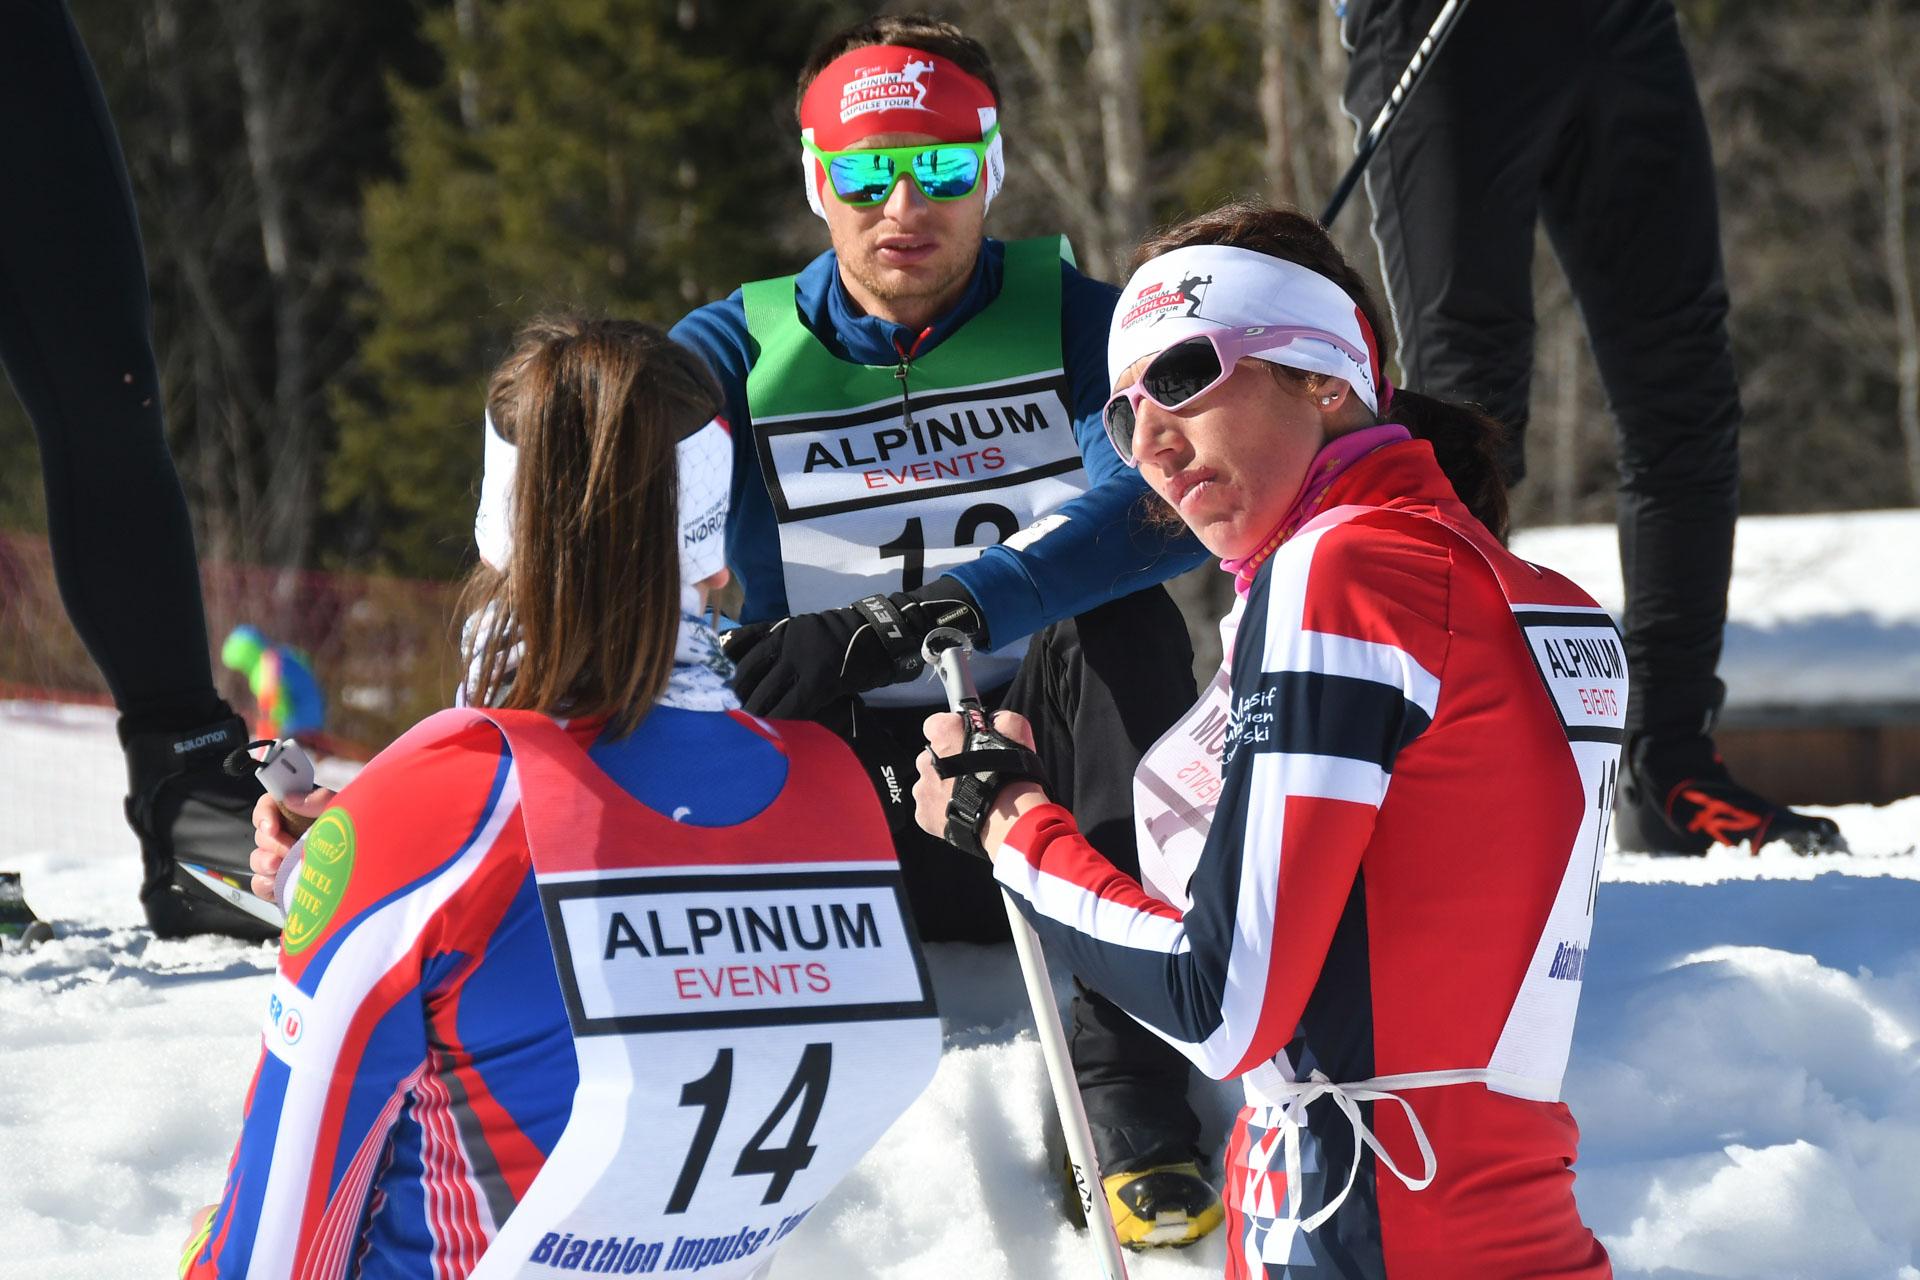 Alpinum-Biathlon-Impulse-Tour-2019©JulieRuly_192